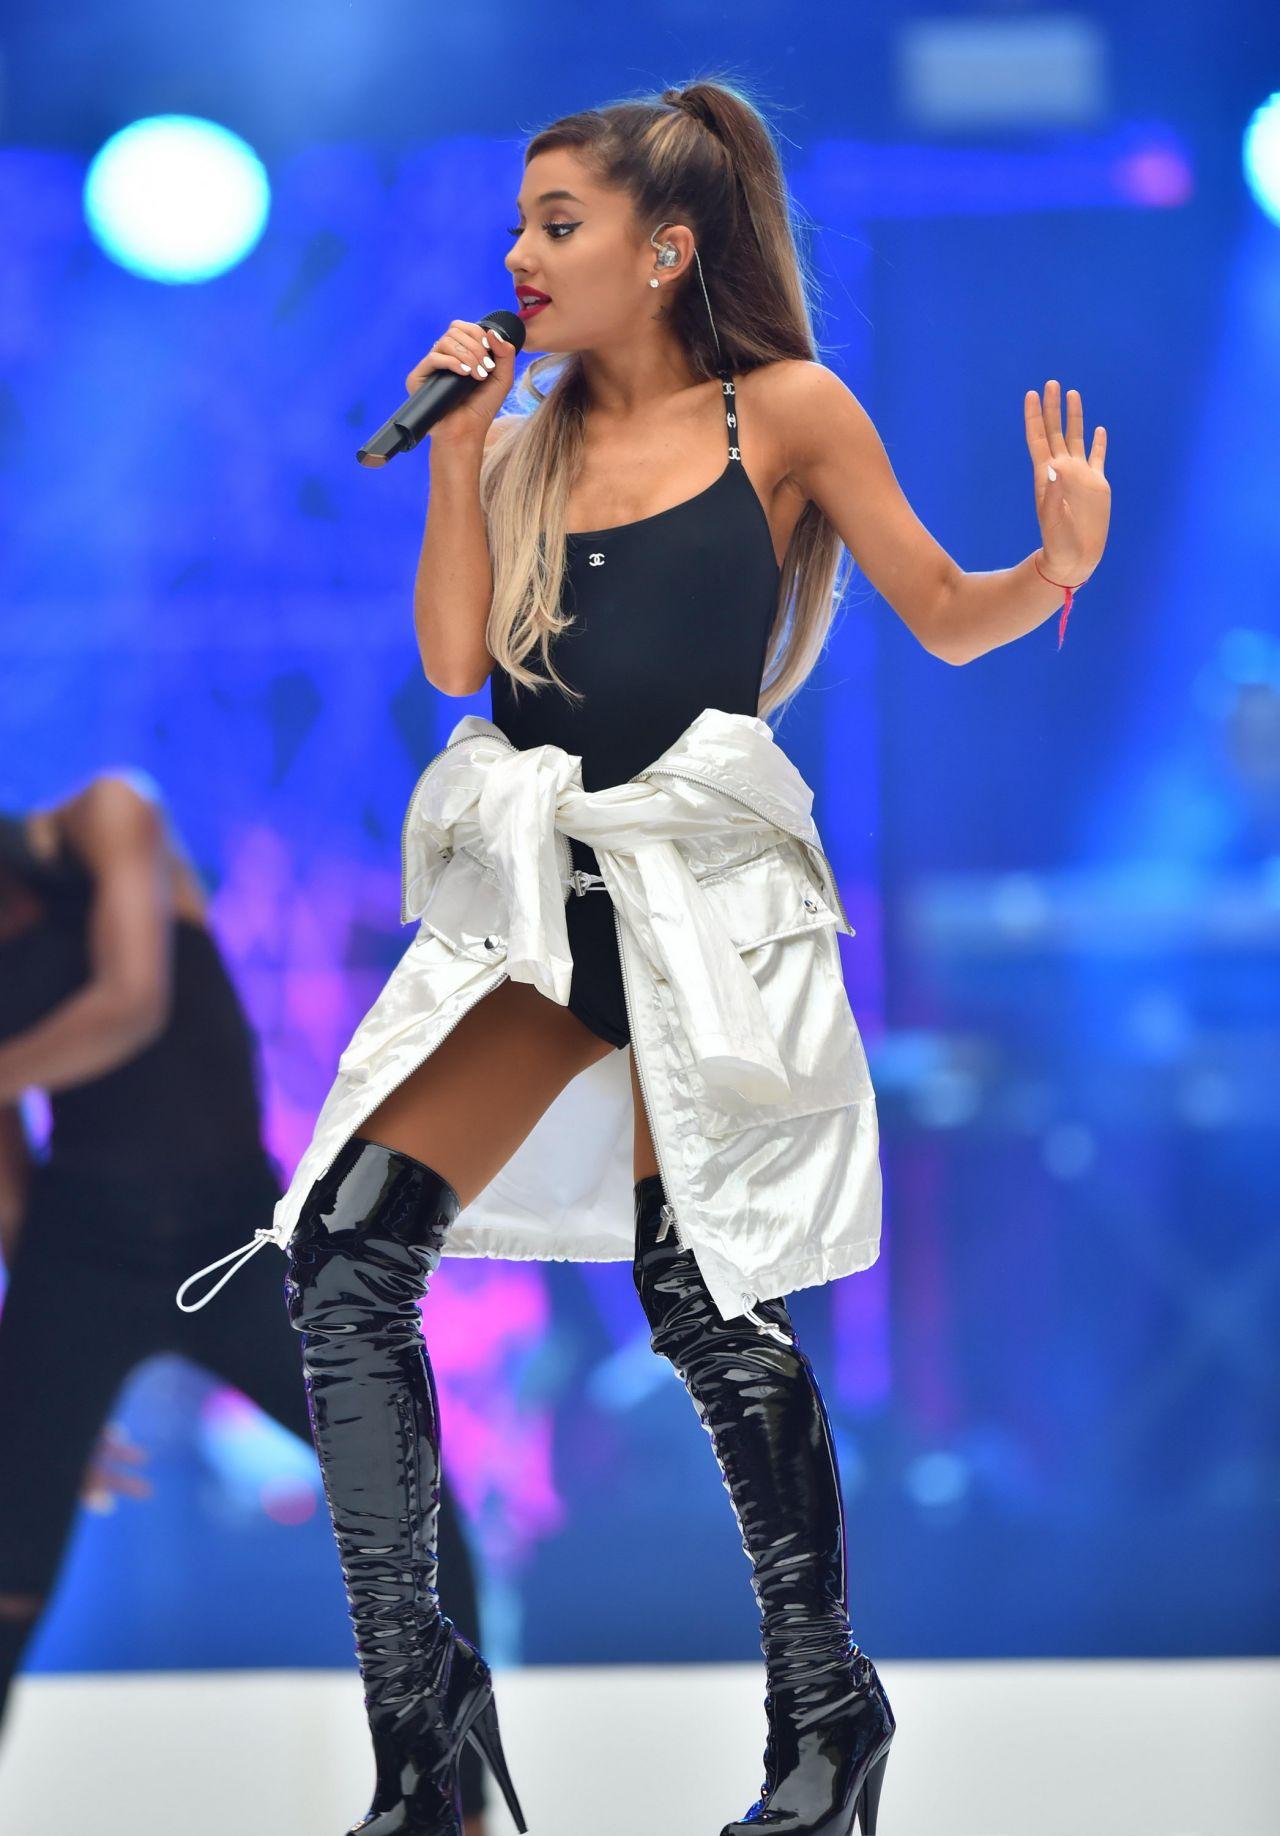 Ariana Grande - Performing at Capital FMs Summertime Ball